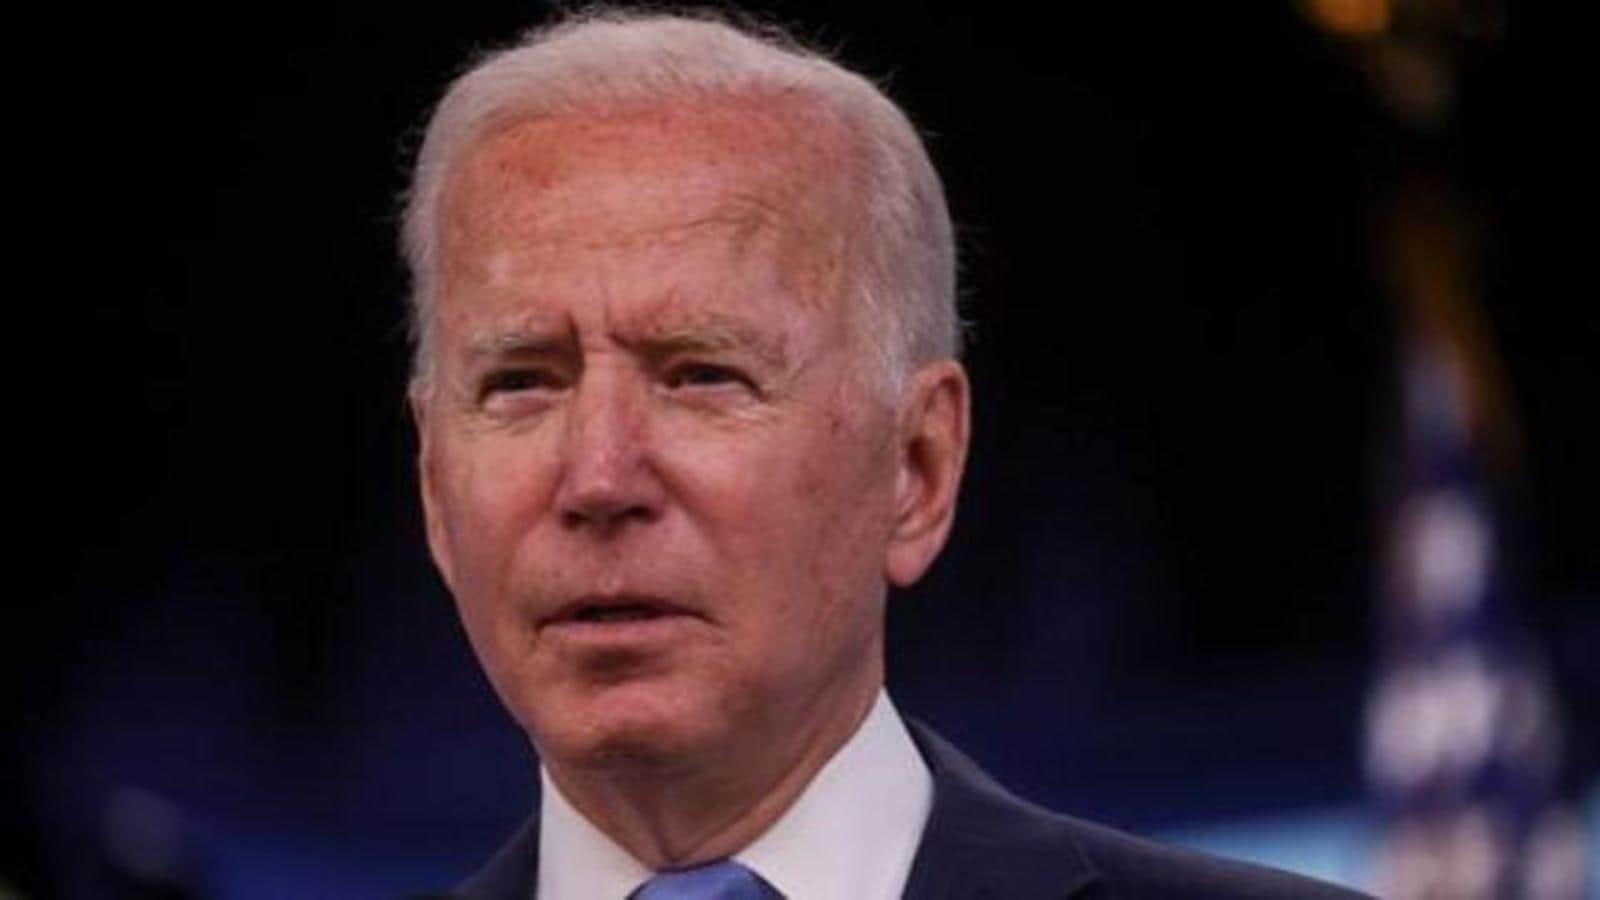 Joe Biden mocked after calling Australian PM 'that fellow down under'